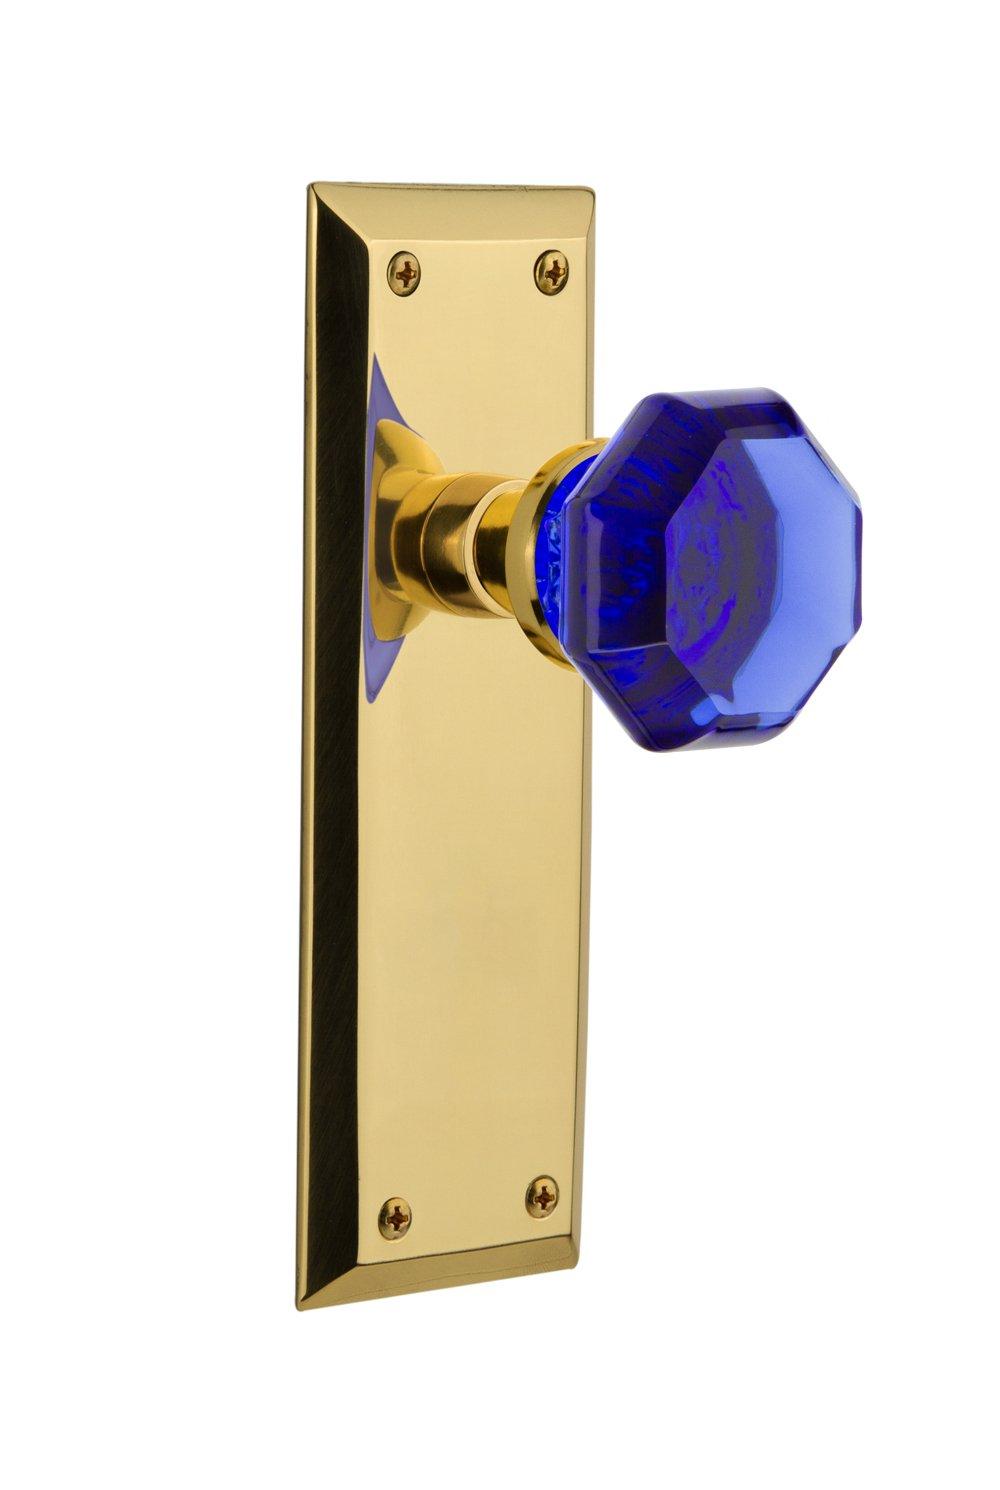 2.75 Nostalgic Warehouse 720888 New York Plate Passage Waldorf Cobalt Door Knob in Polished Brass